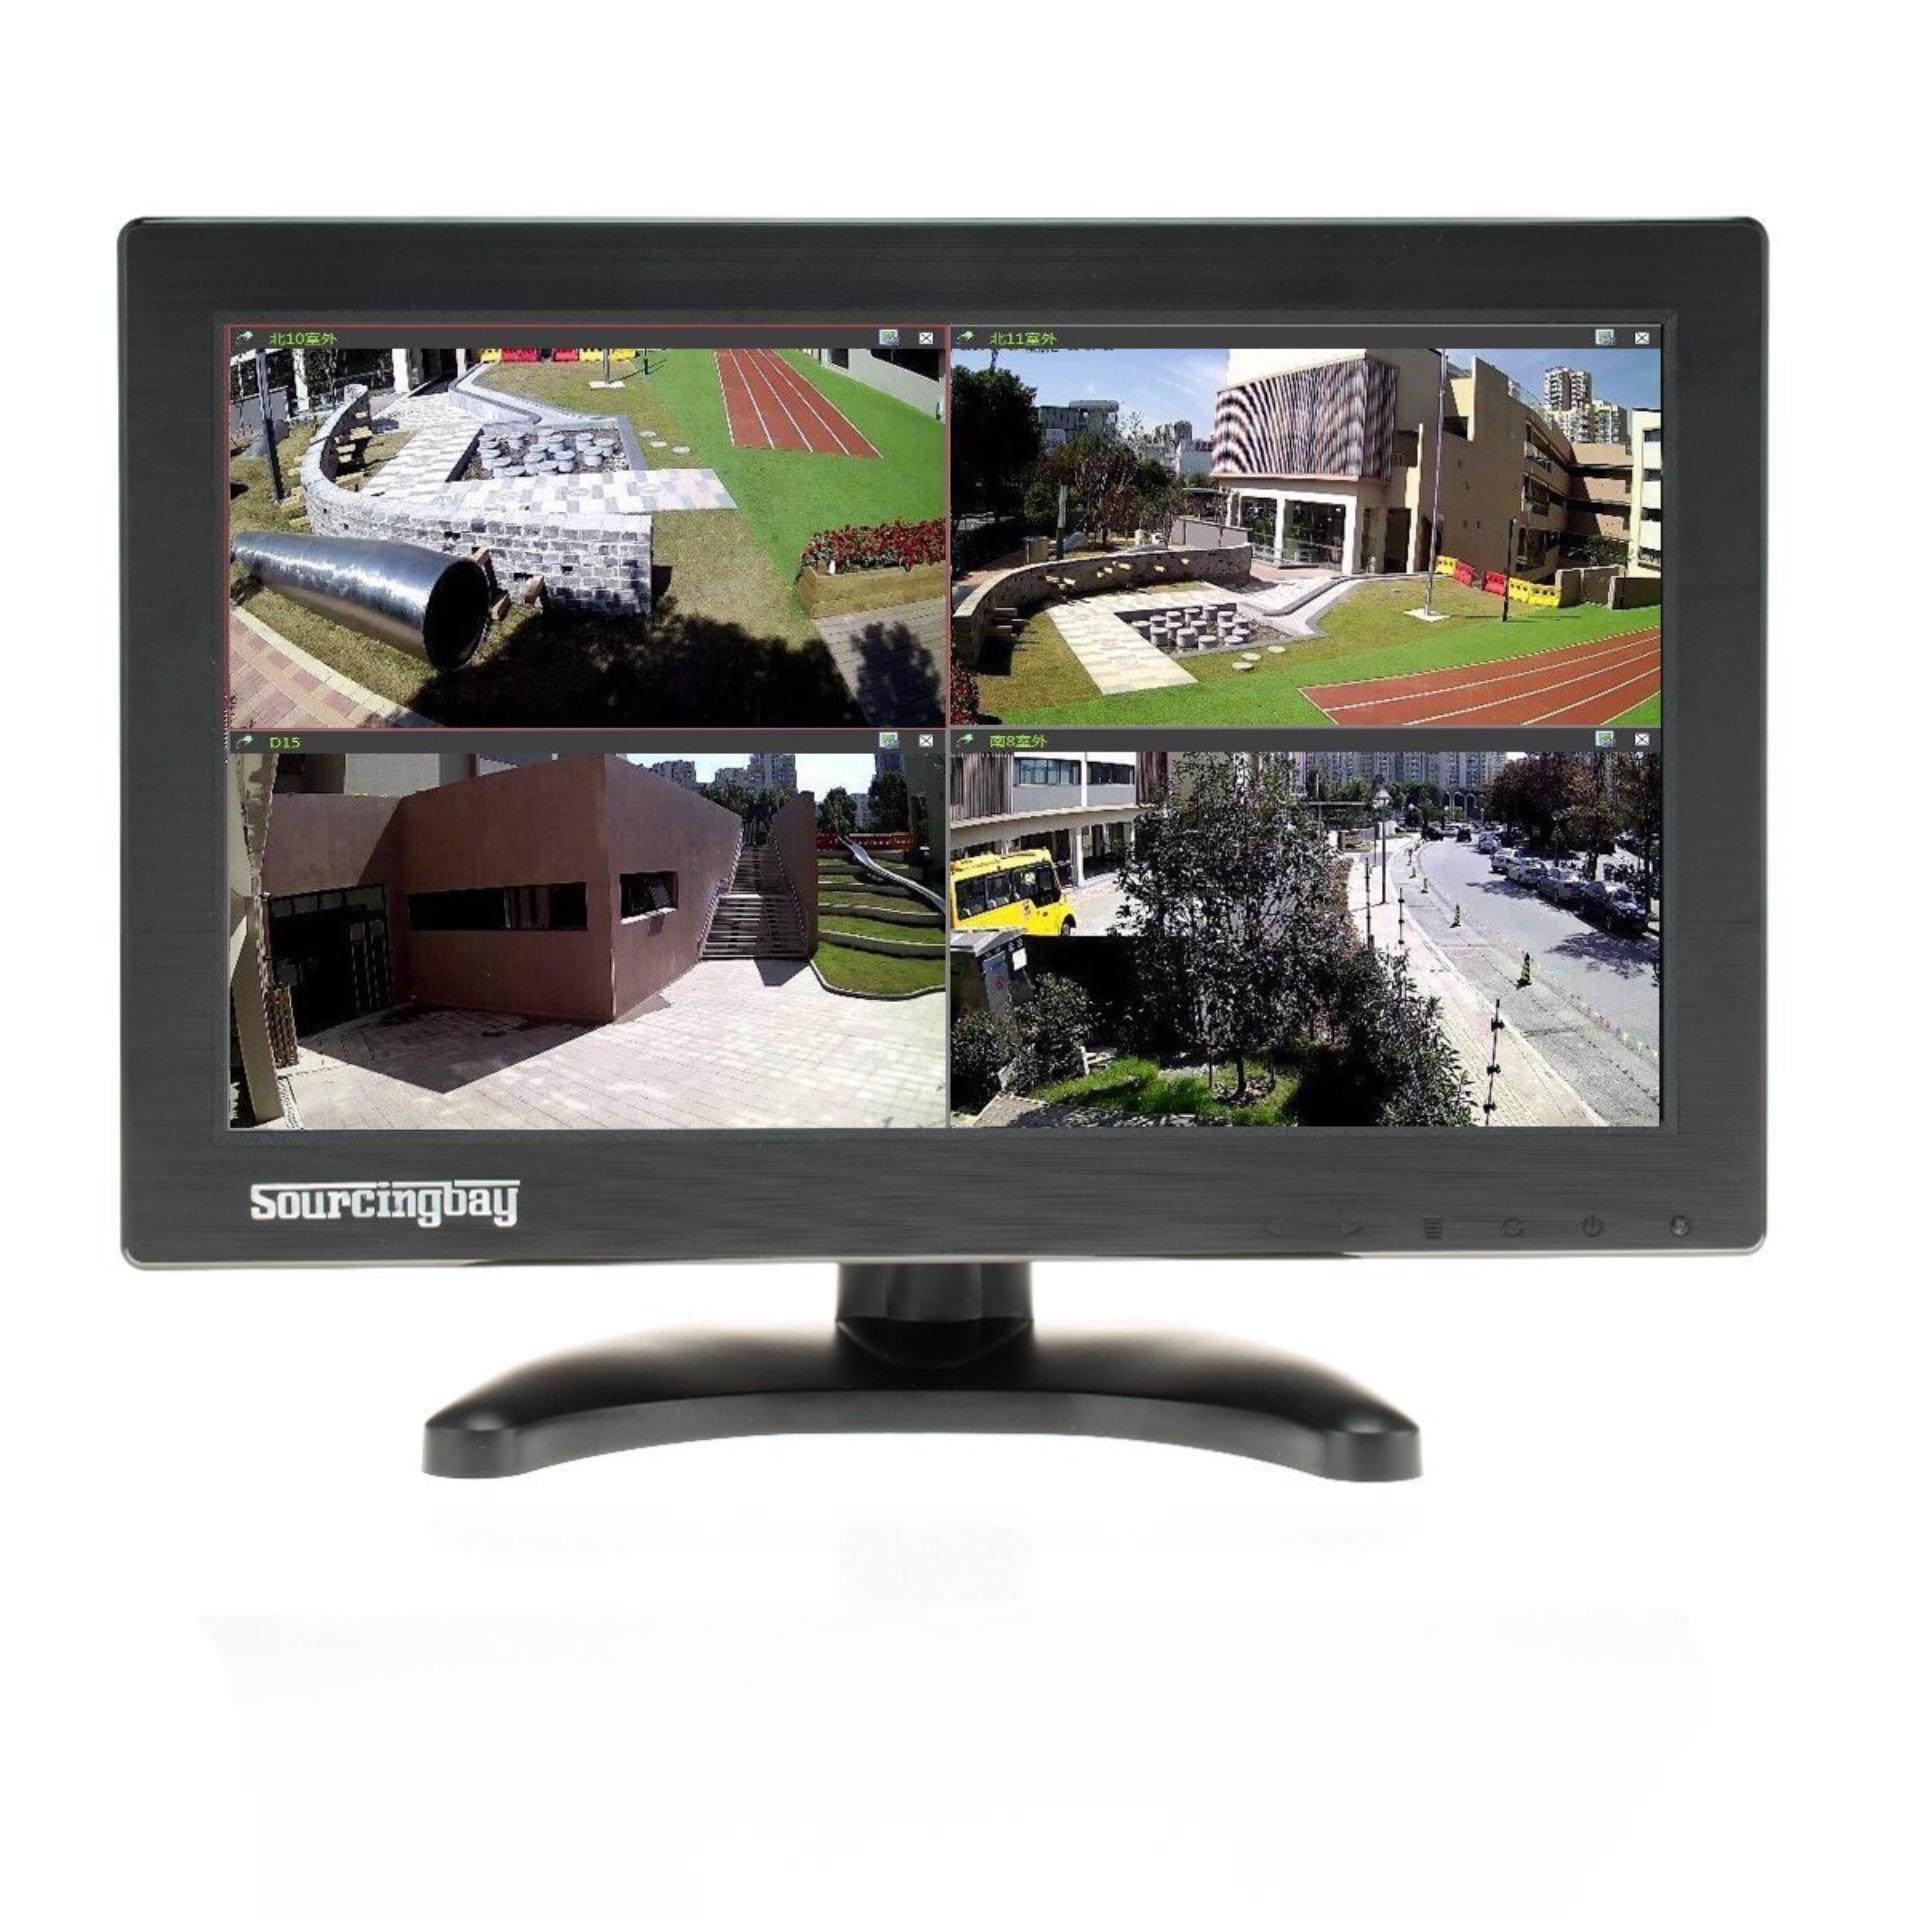 Philippines 116 Inch Cctv Monitor Sourcingbay Yt116 Tft Lcd Vga To Bnc Adapter Screen Mini 1366768 Video